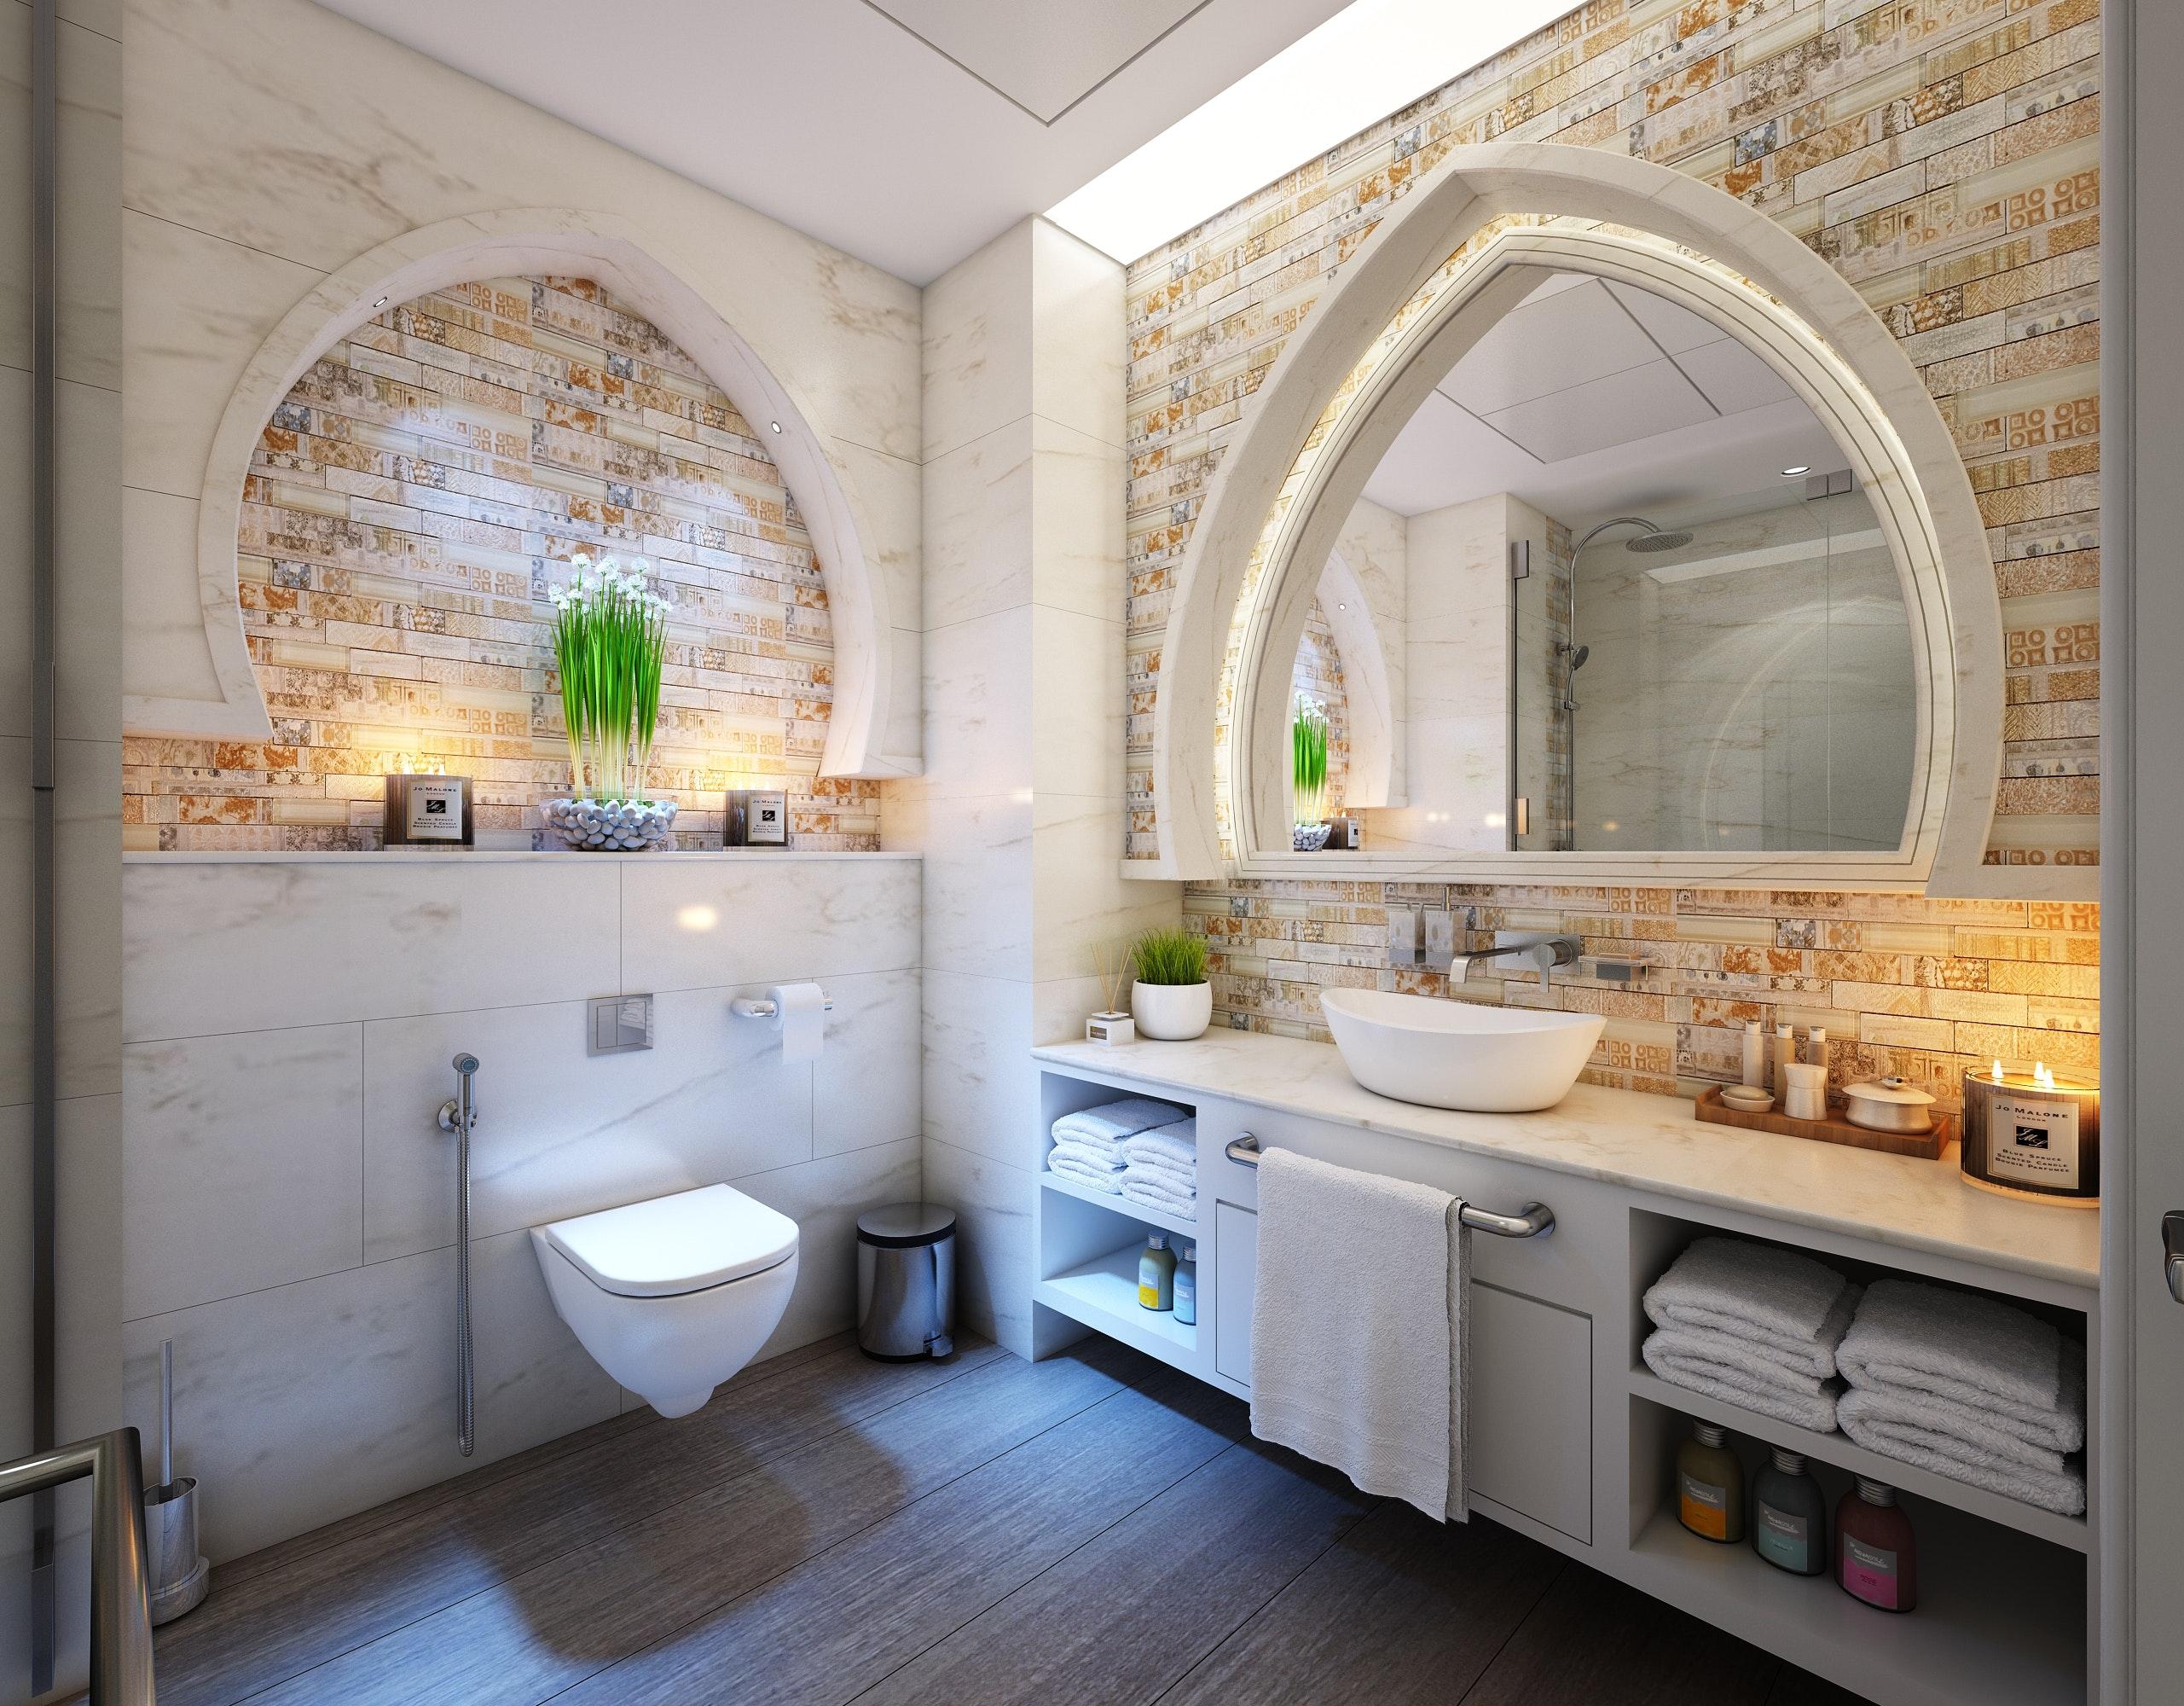 Ett lyxigt badrum